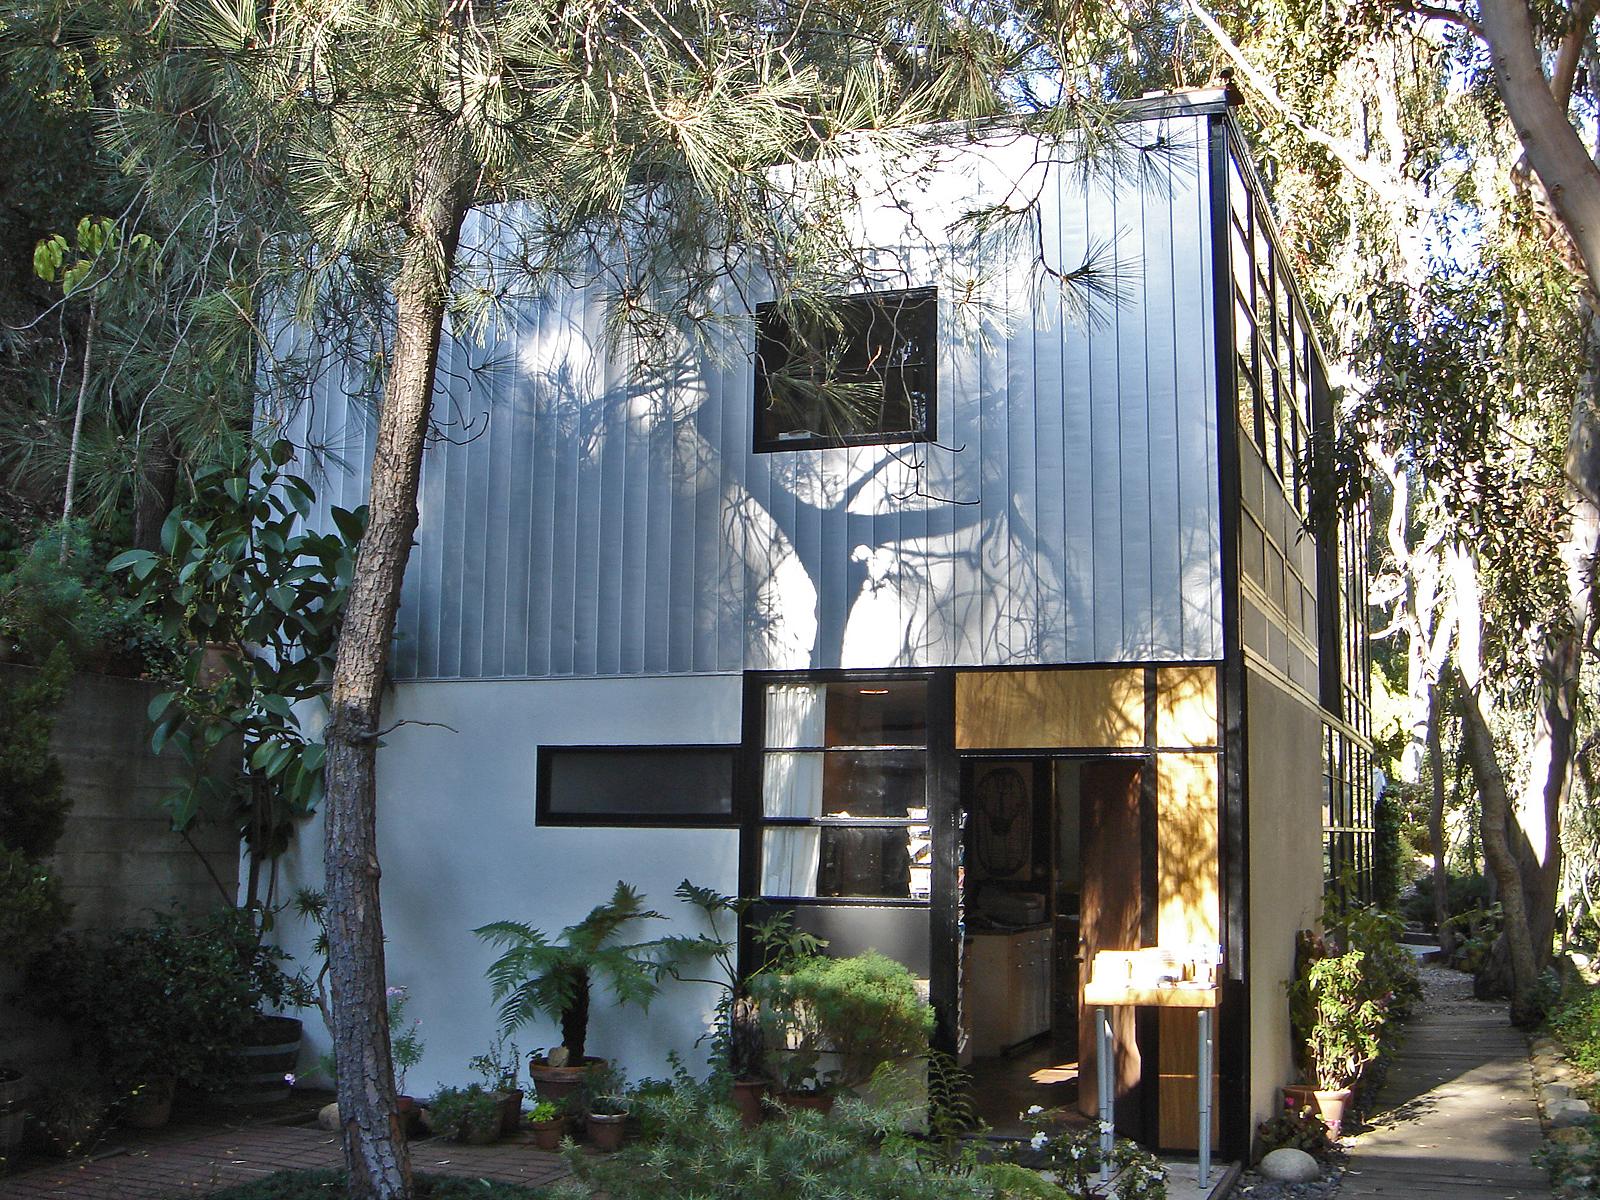 file eames house wikimedia commons. Black Bedroom Furniture Sets. Home Design Ideas